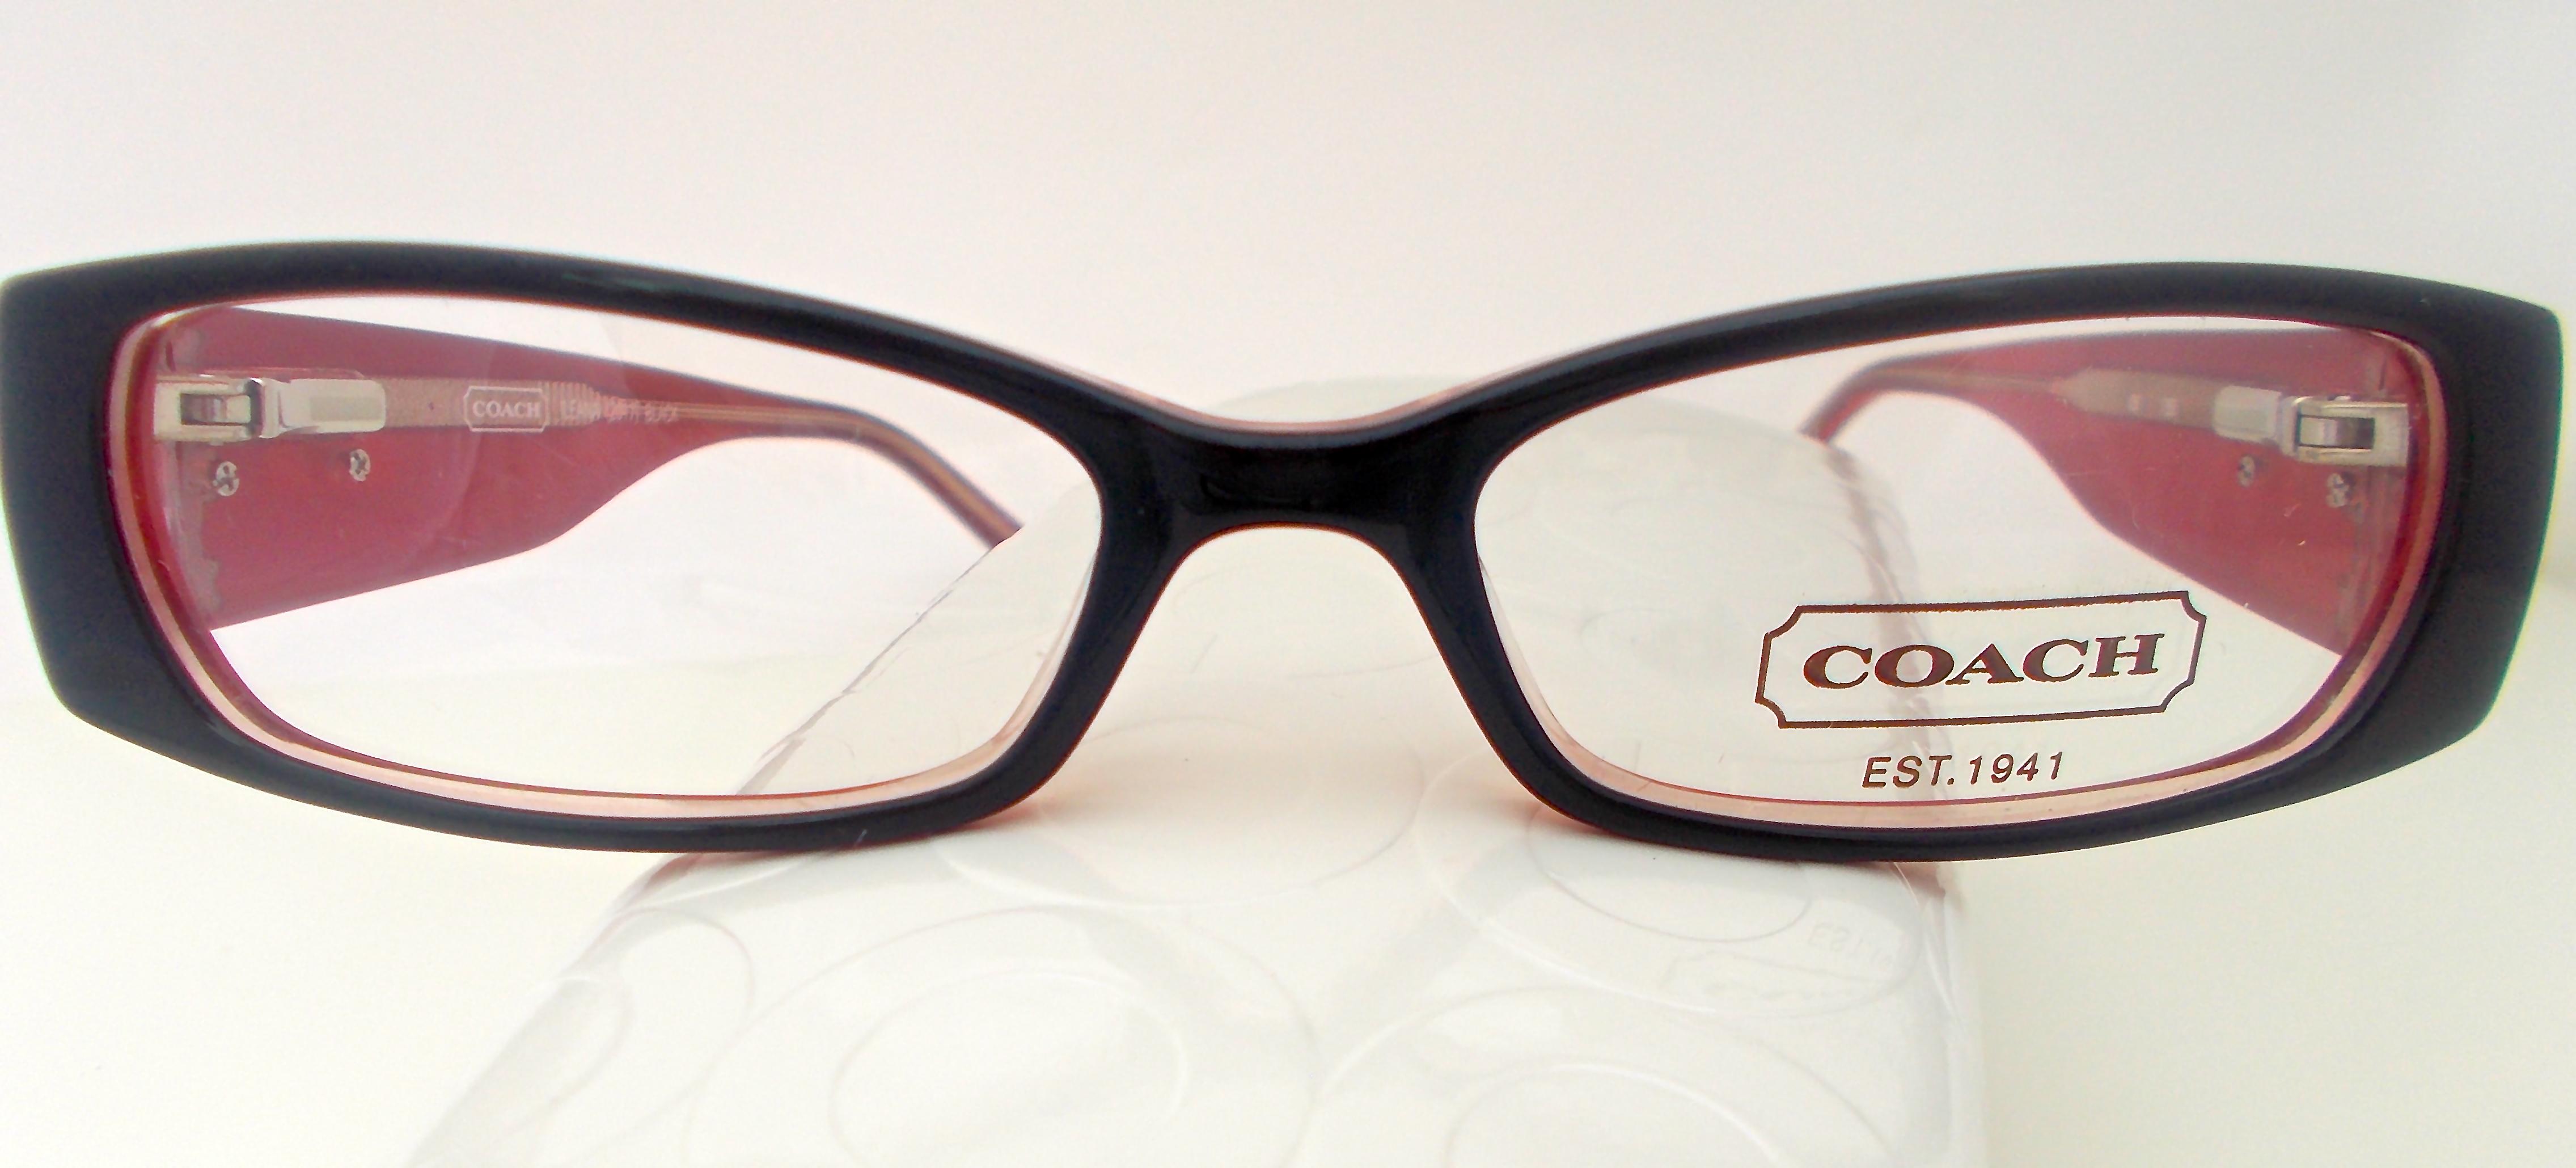 Coach Ladies Eyeglass Frames : H&S Optical Coach Womens Ileana (2017) Black Eyewear ...